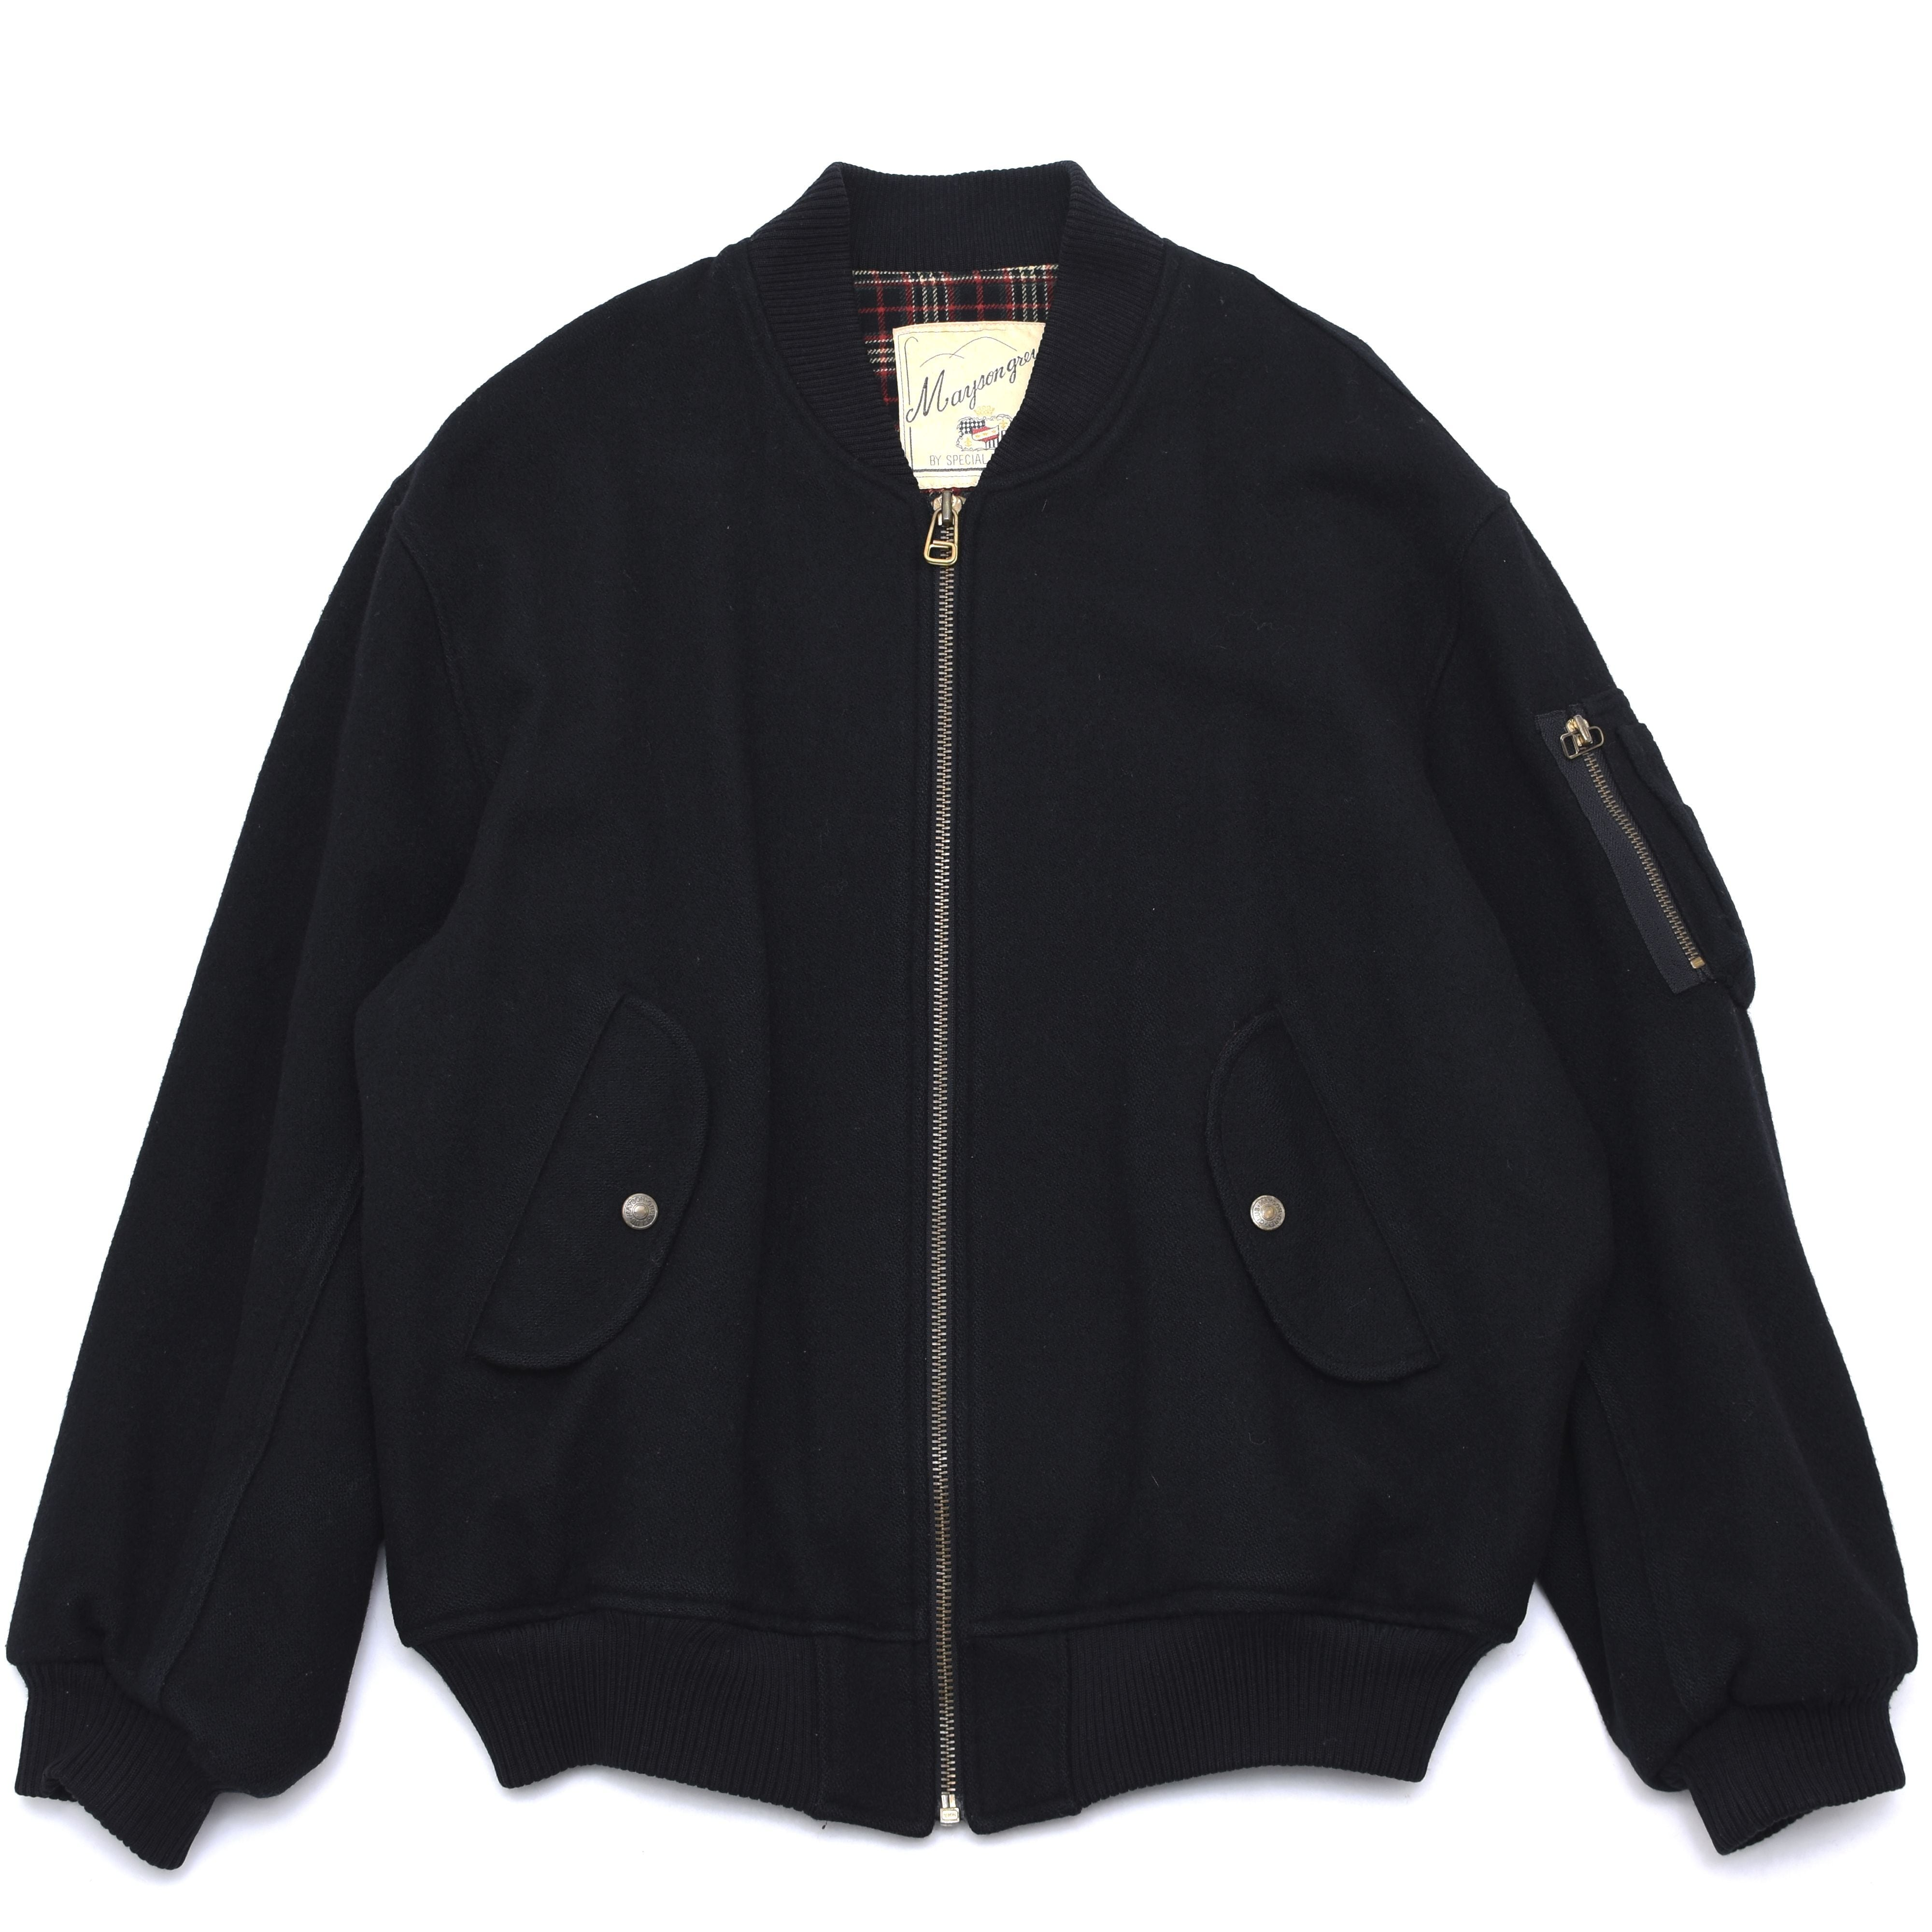 Old black wool bomber jacket